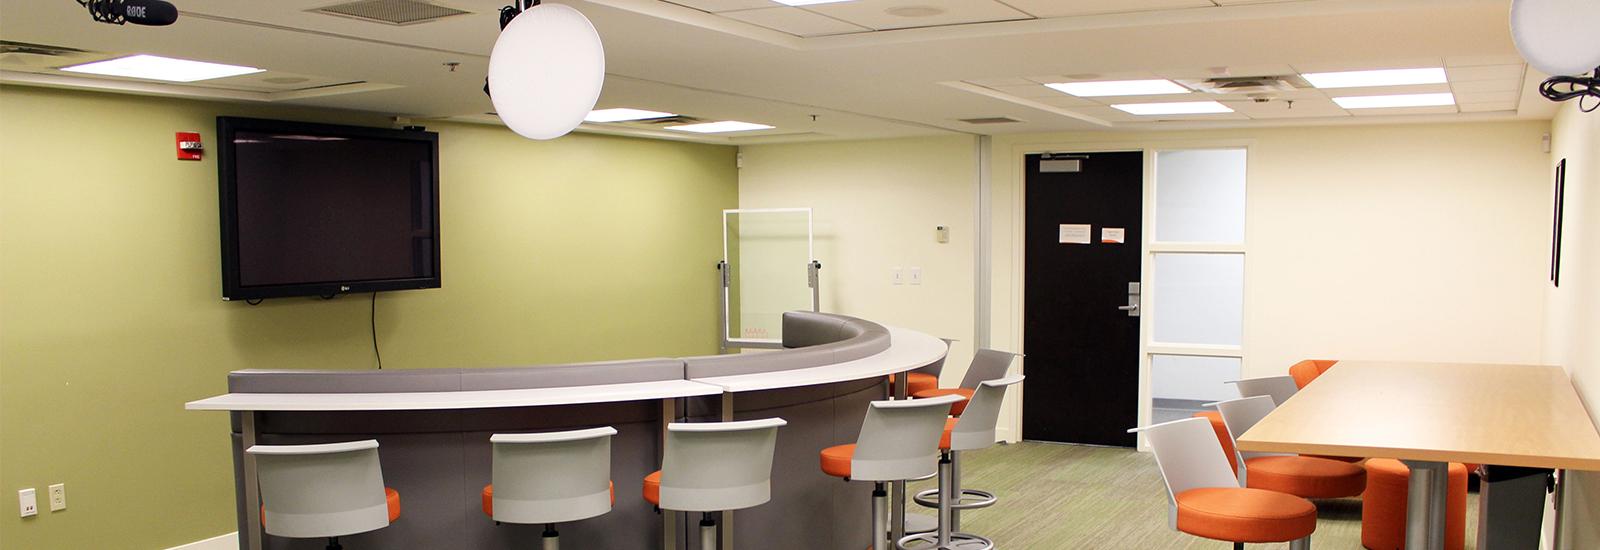 Miami University Library Study Room